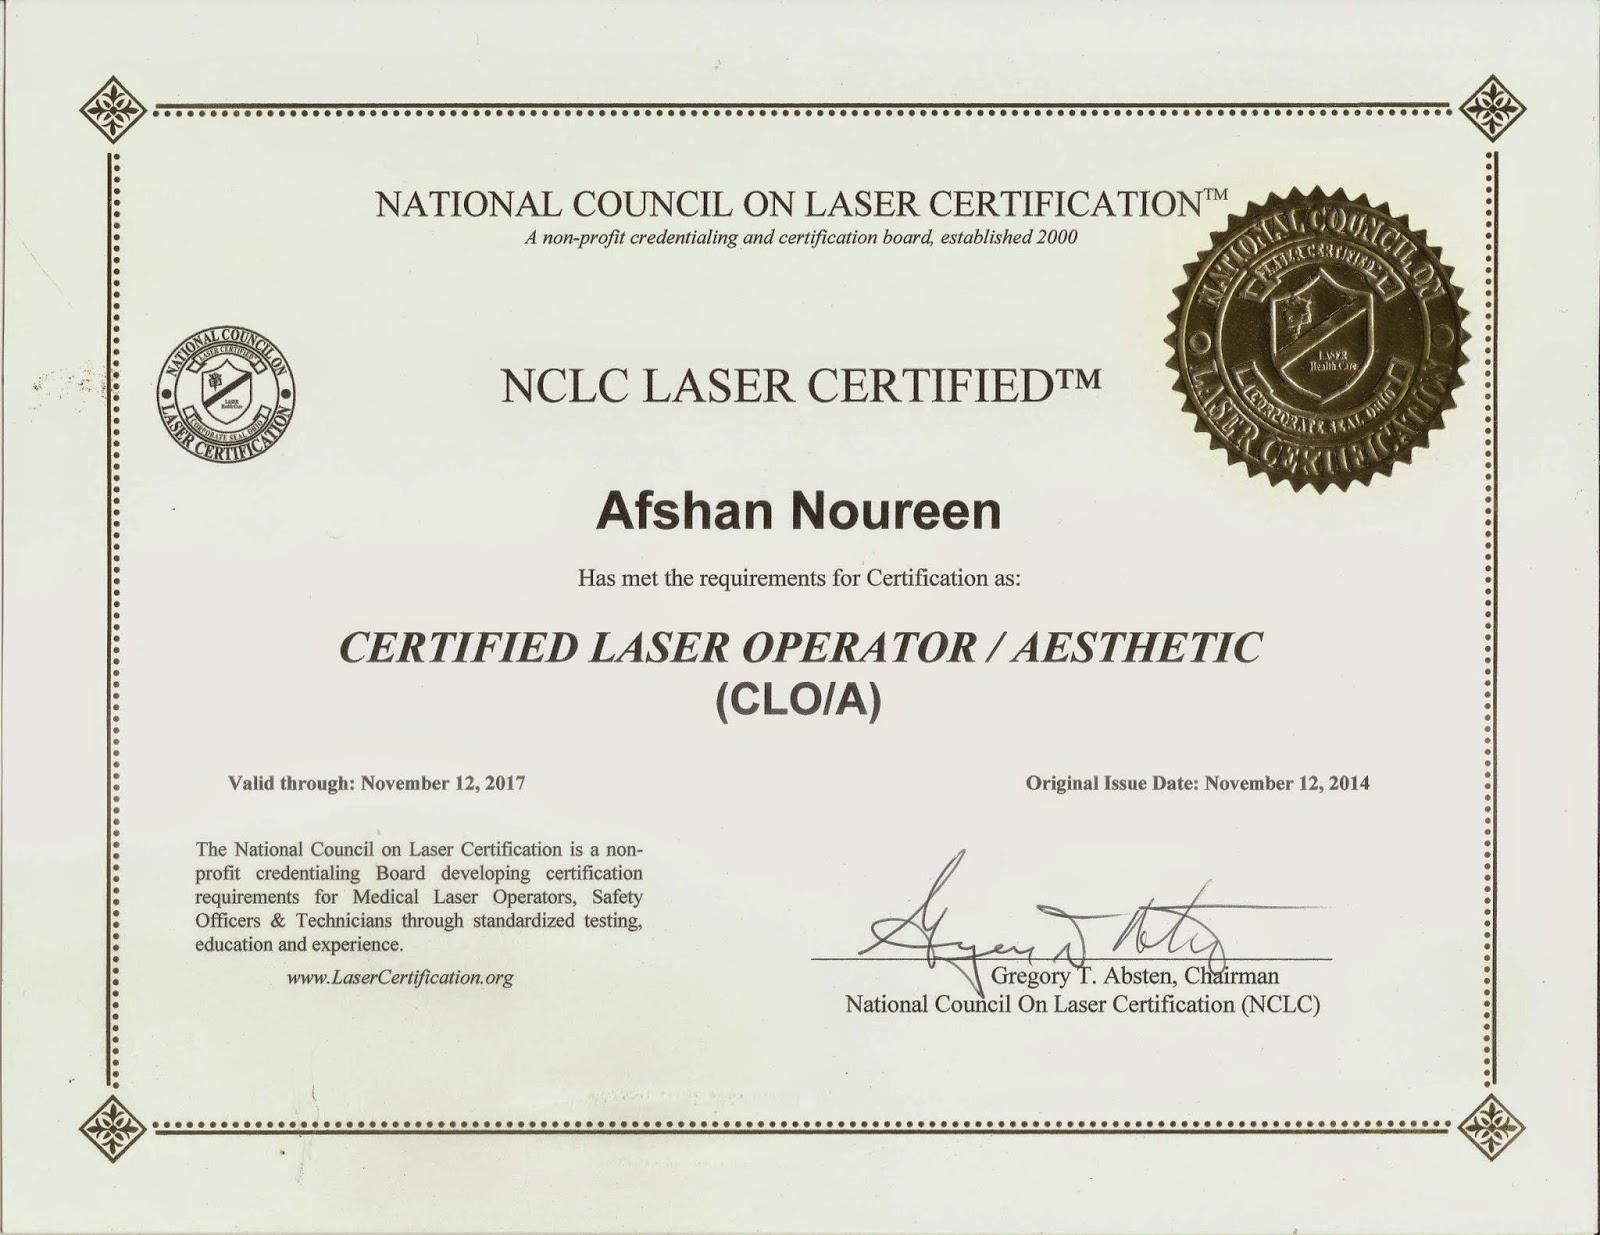 Laser hair removal mrs afshan noureen american certified laser mrs afshan noureen aesthetic laser specialist ima dubai xflitez Choice Image